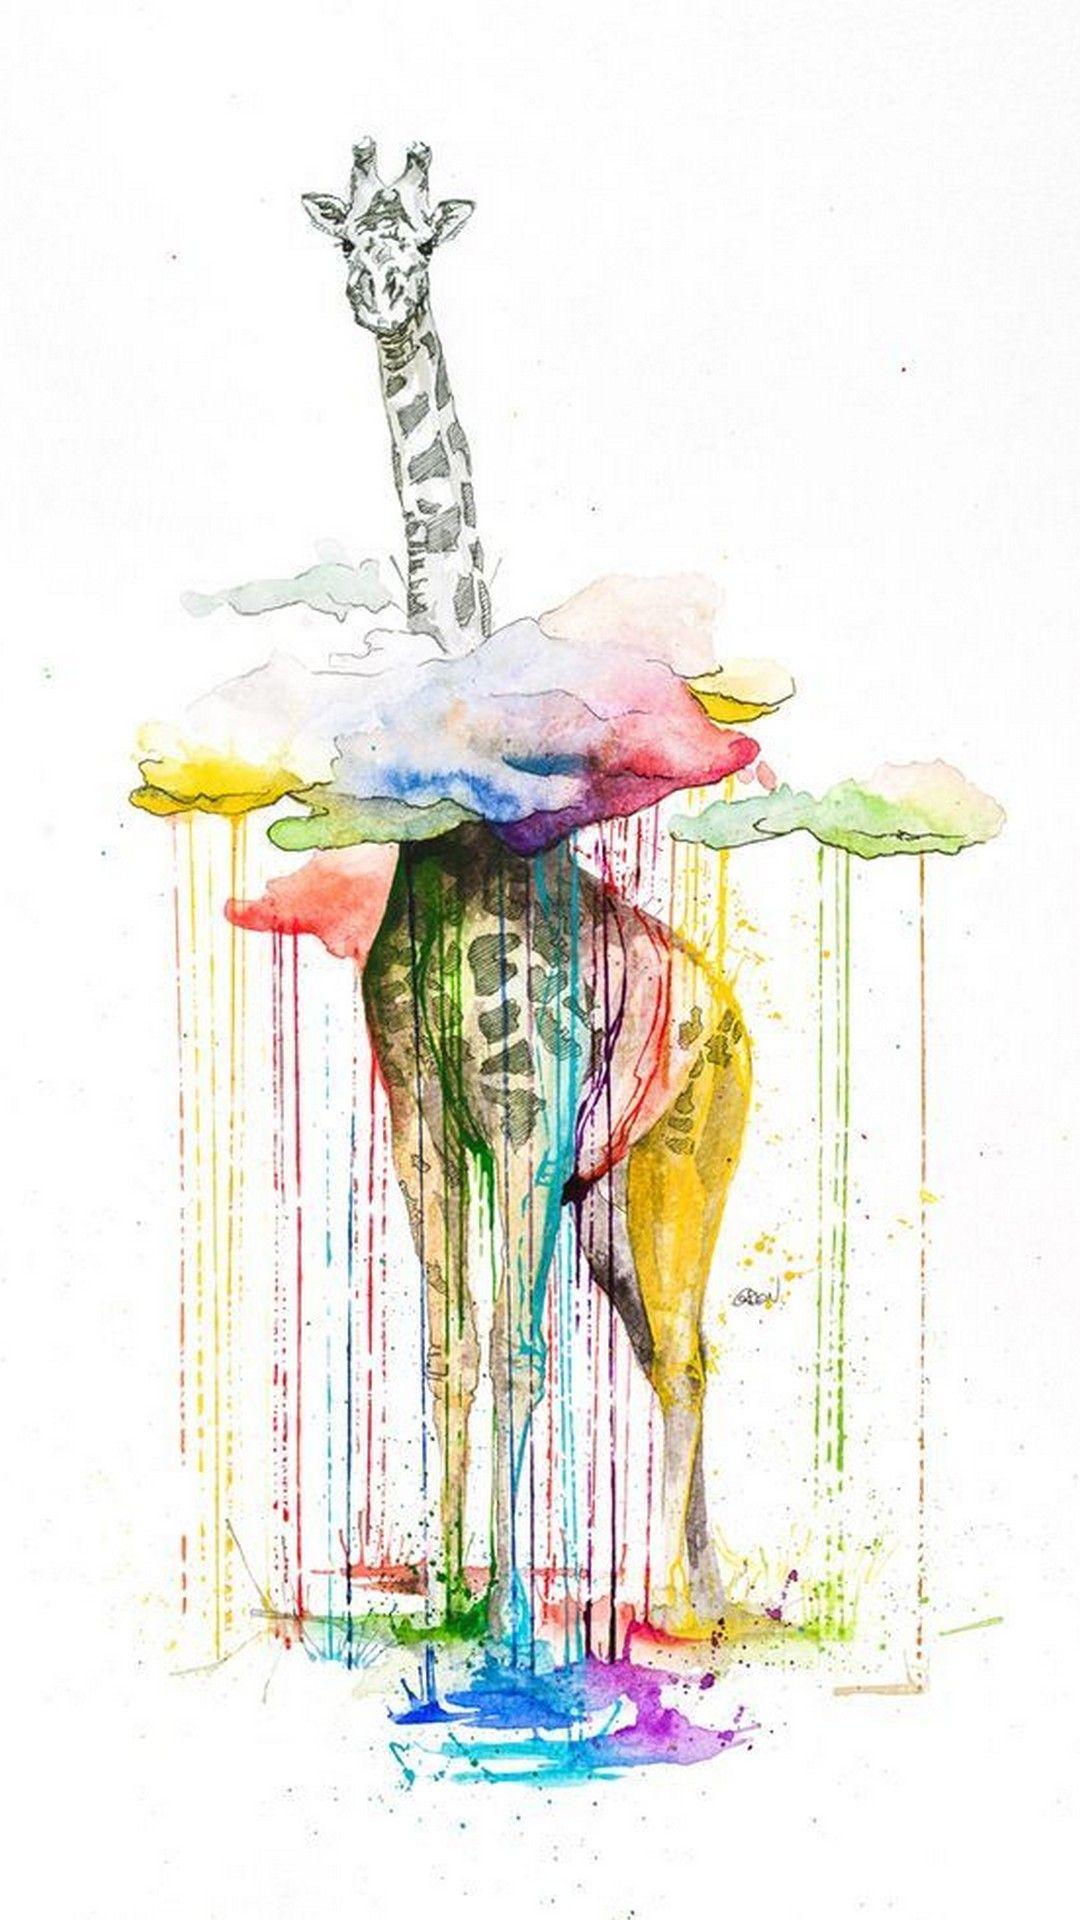 Best Wallpaper Colorful Giraffe - e0a8f69e58c5ff71136410cd8d7ceffb  Image_469440 .jpg